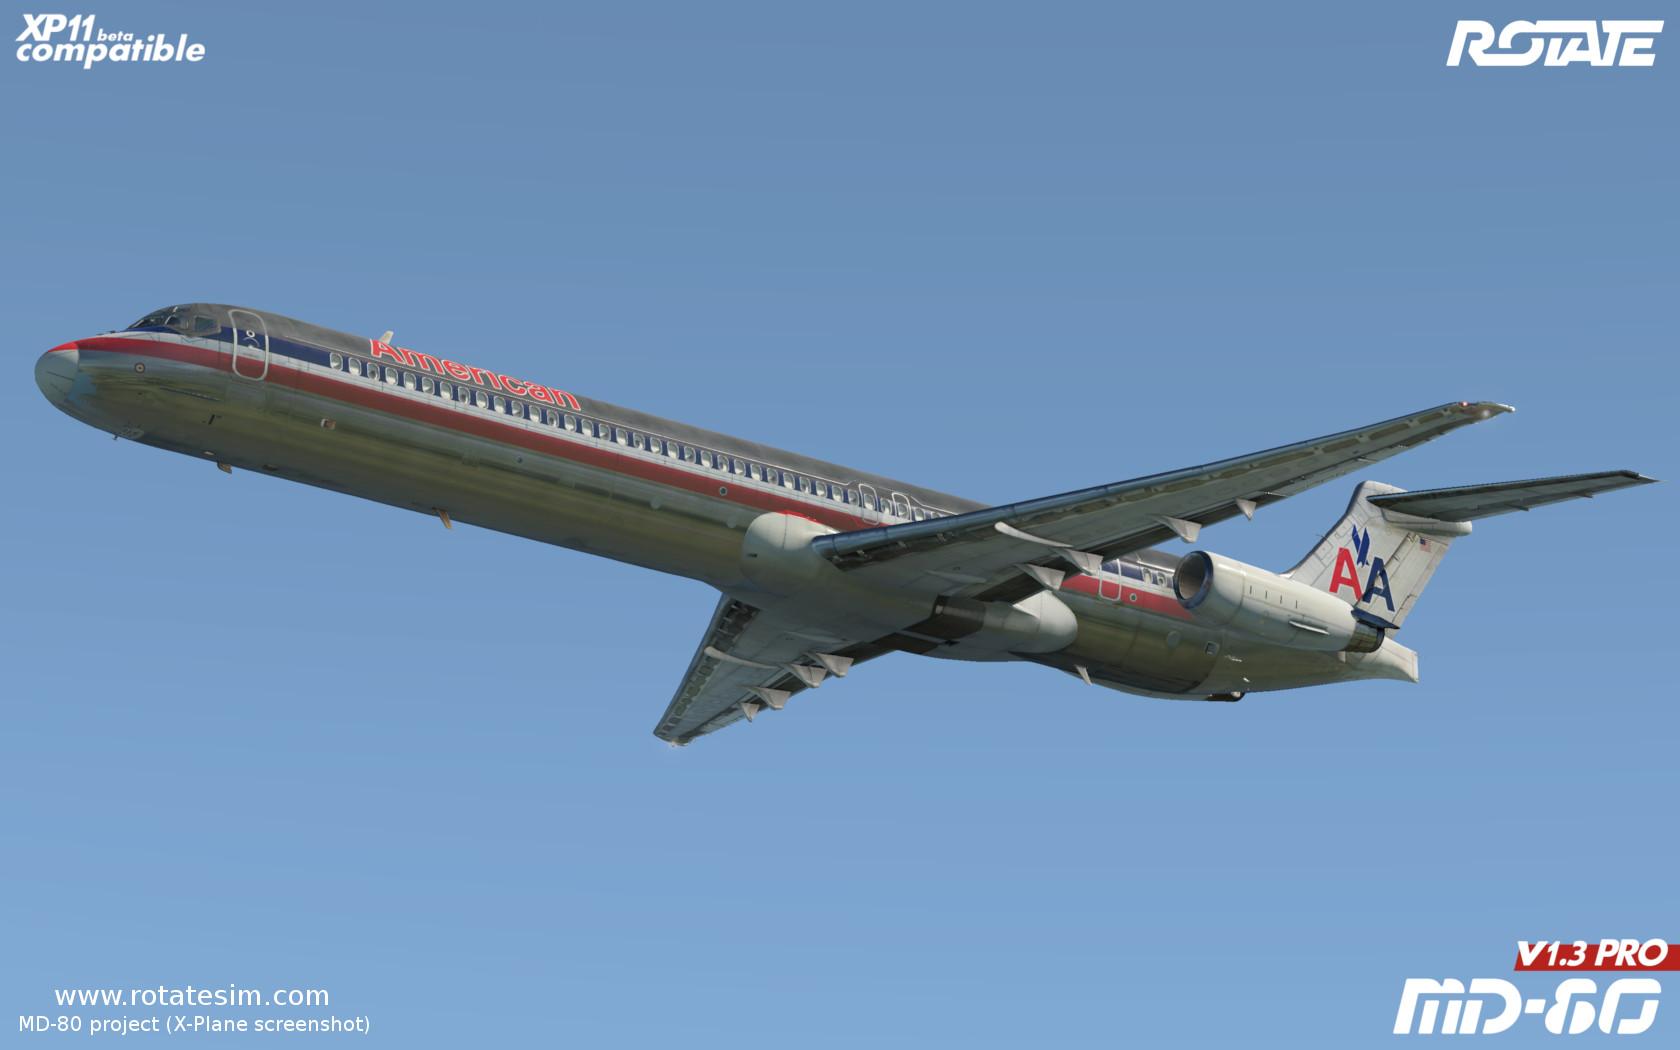 Rotate MD-80v1.3 Pro